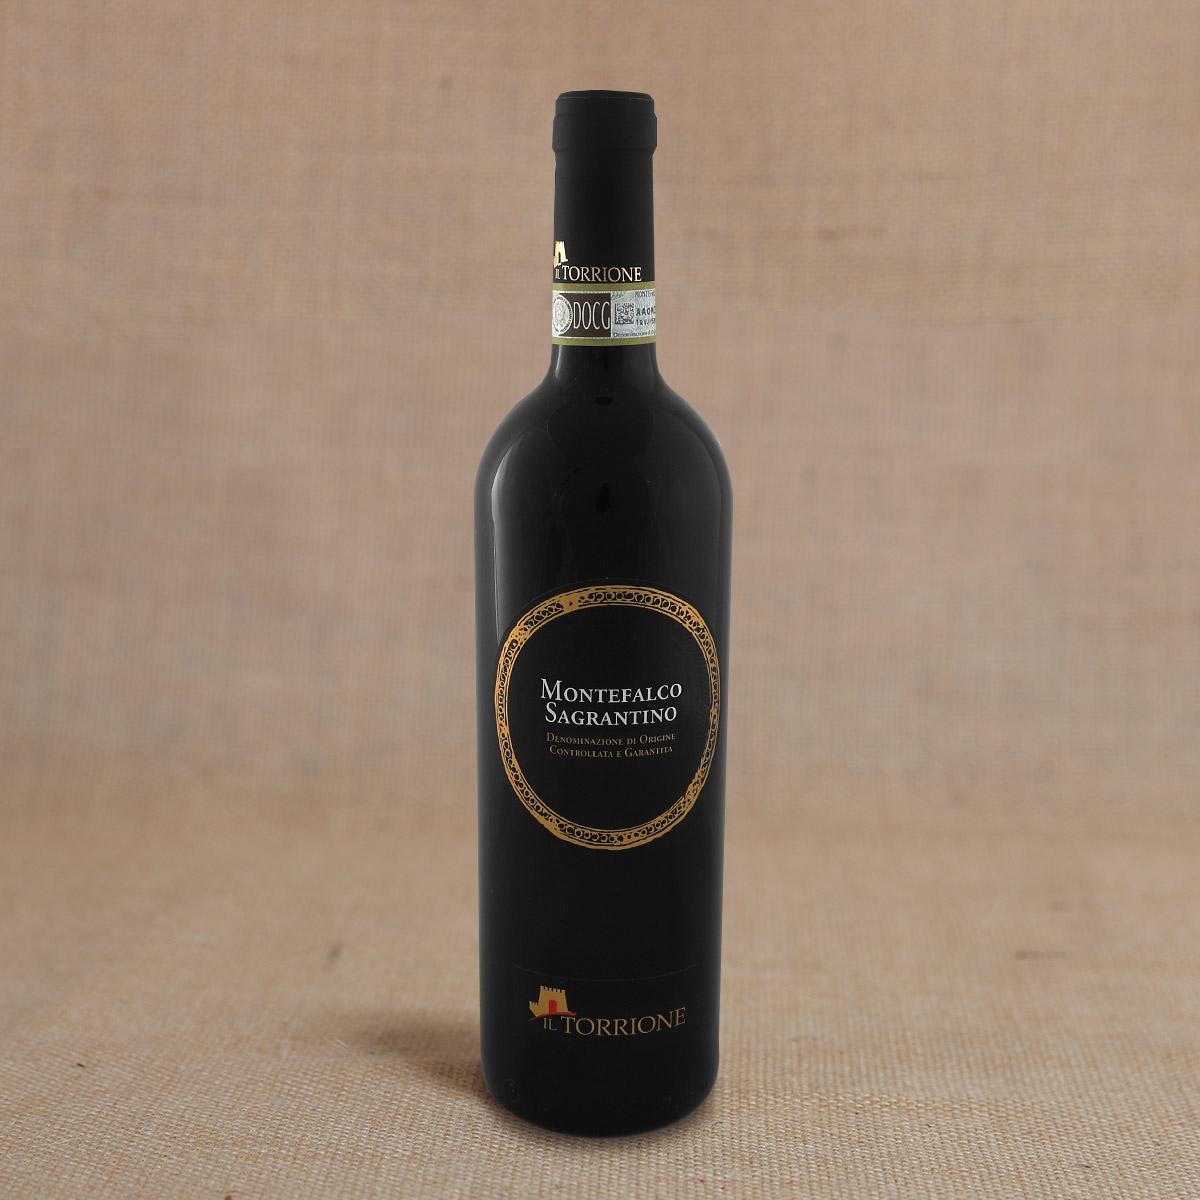 vino-montefalco-sagrantino-il-torrione-sapori-terra-umbra